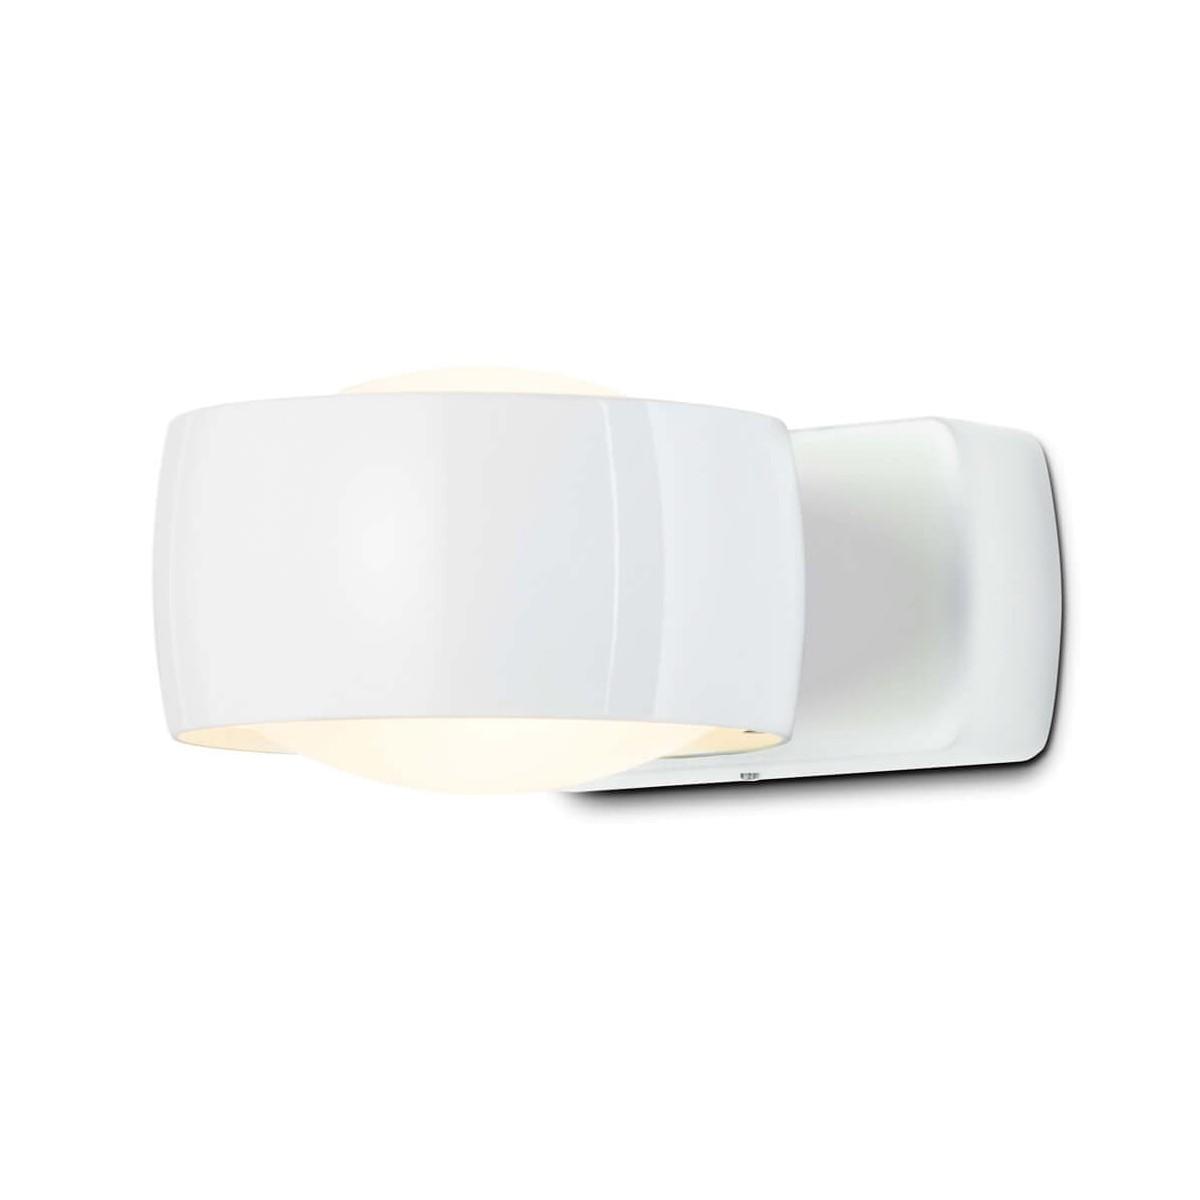 Oligo Grace LED Wandleuchte, weiß glänzend